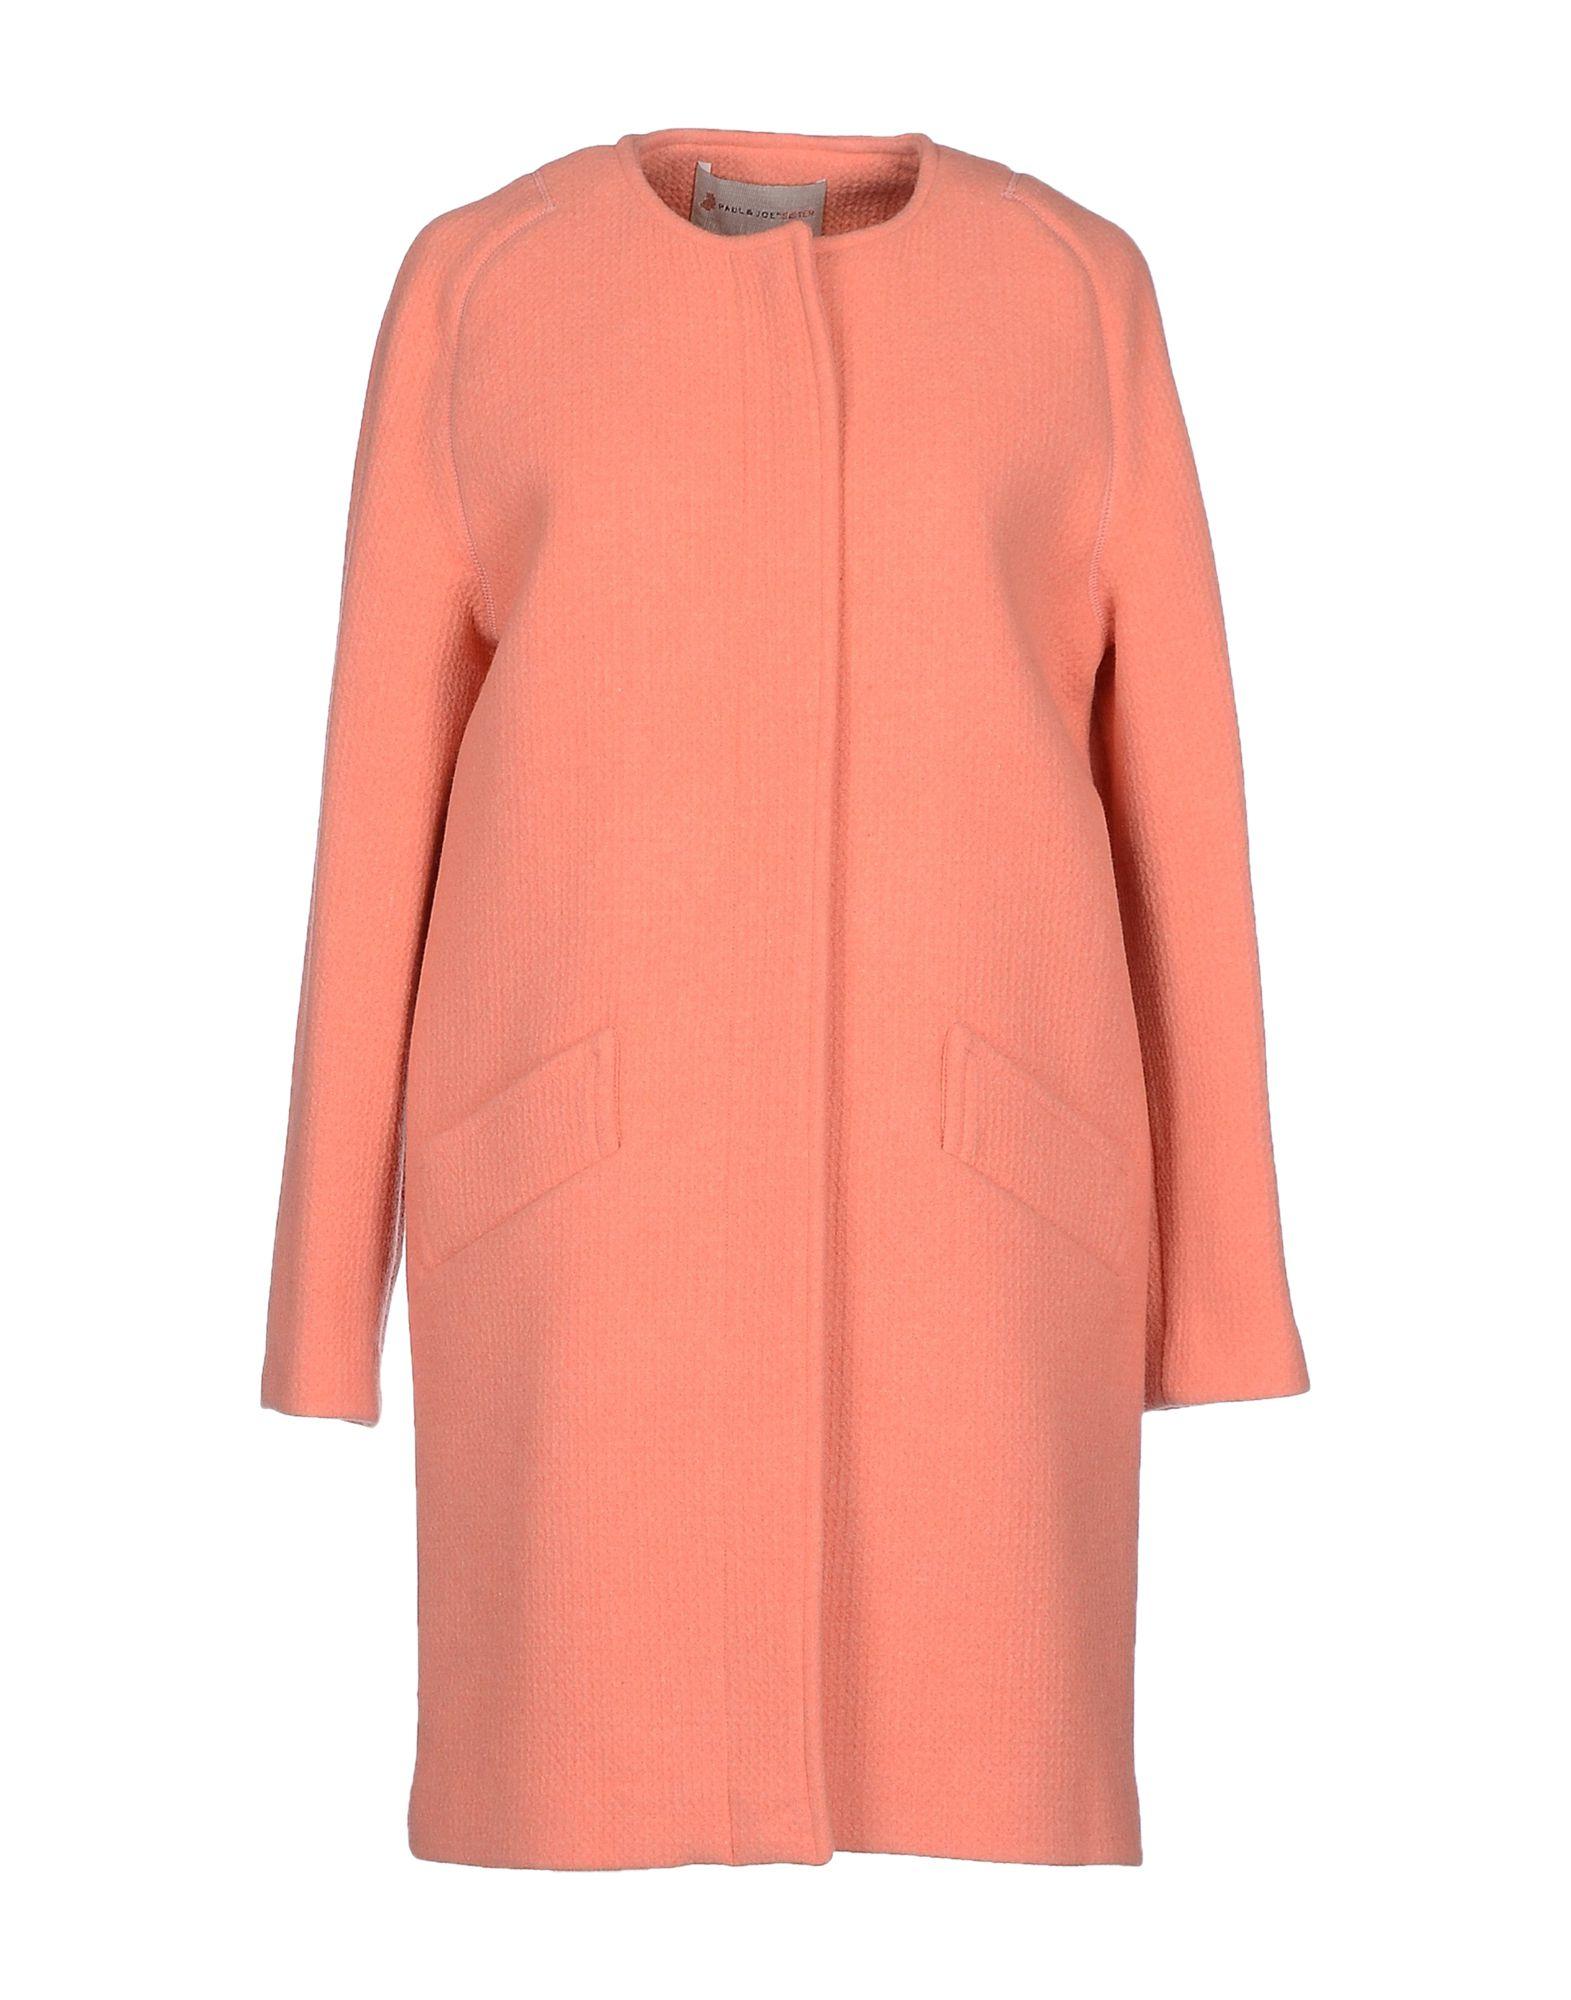 Paul & joe Coat in Pink | Lyst